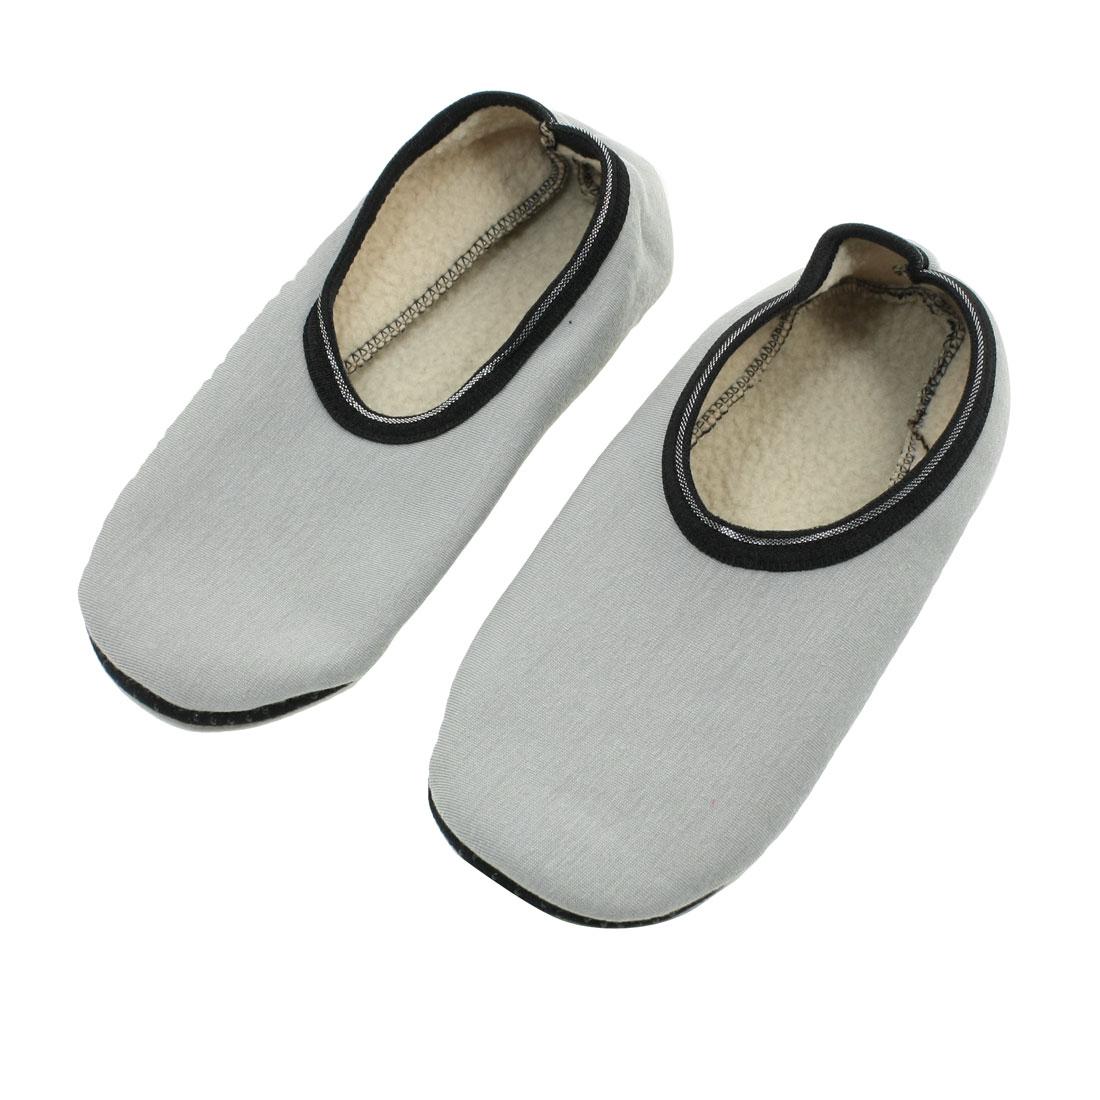 Lady Winter Floor Room Soft Anti Slip Boat Socks Size M Pair Gray